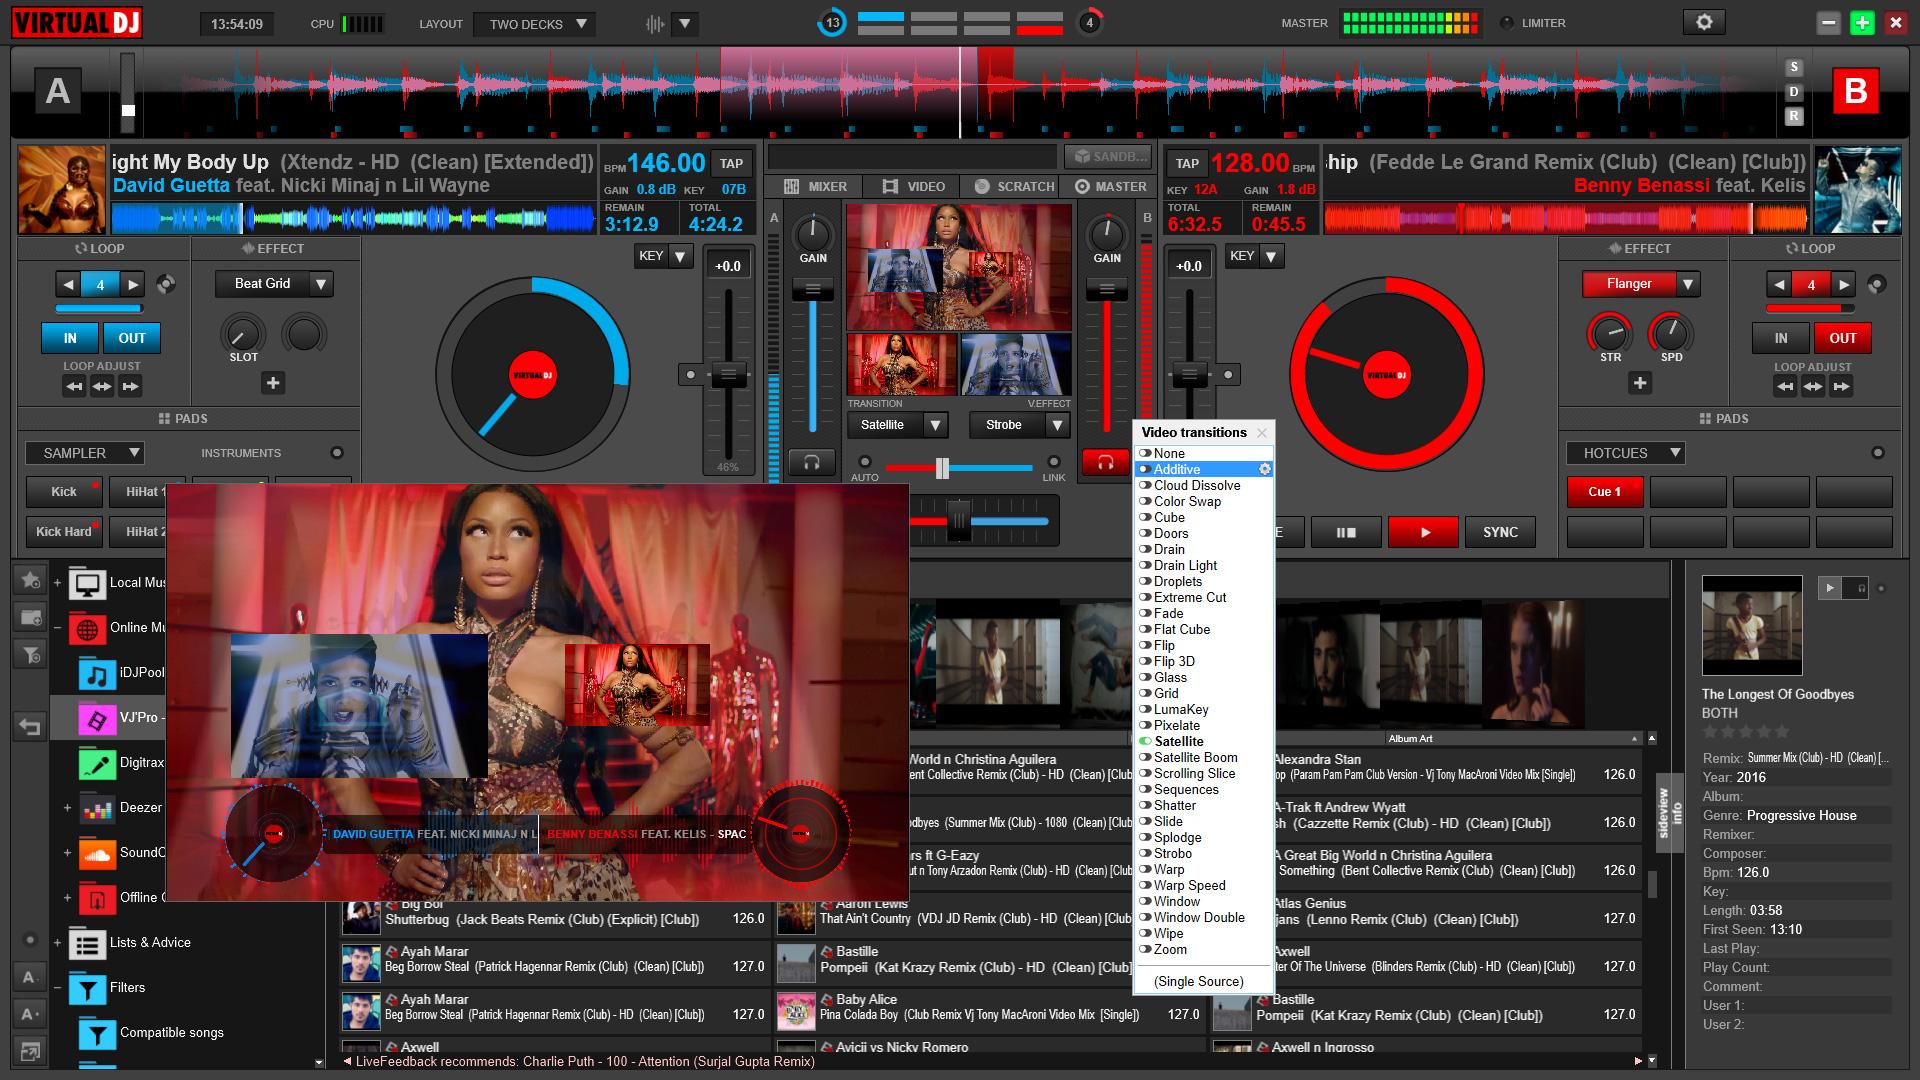 DJ Software - VirtualDJ - The #1 Most Popular DJ Software